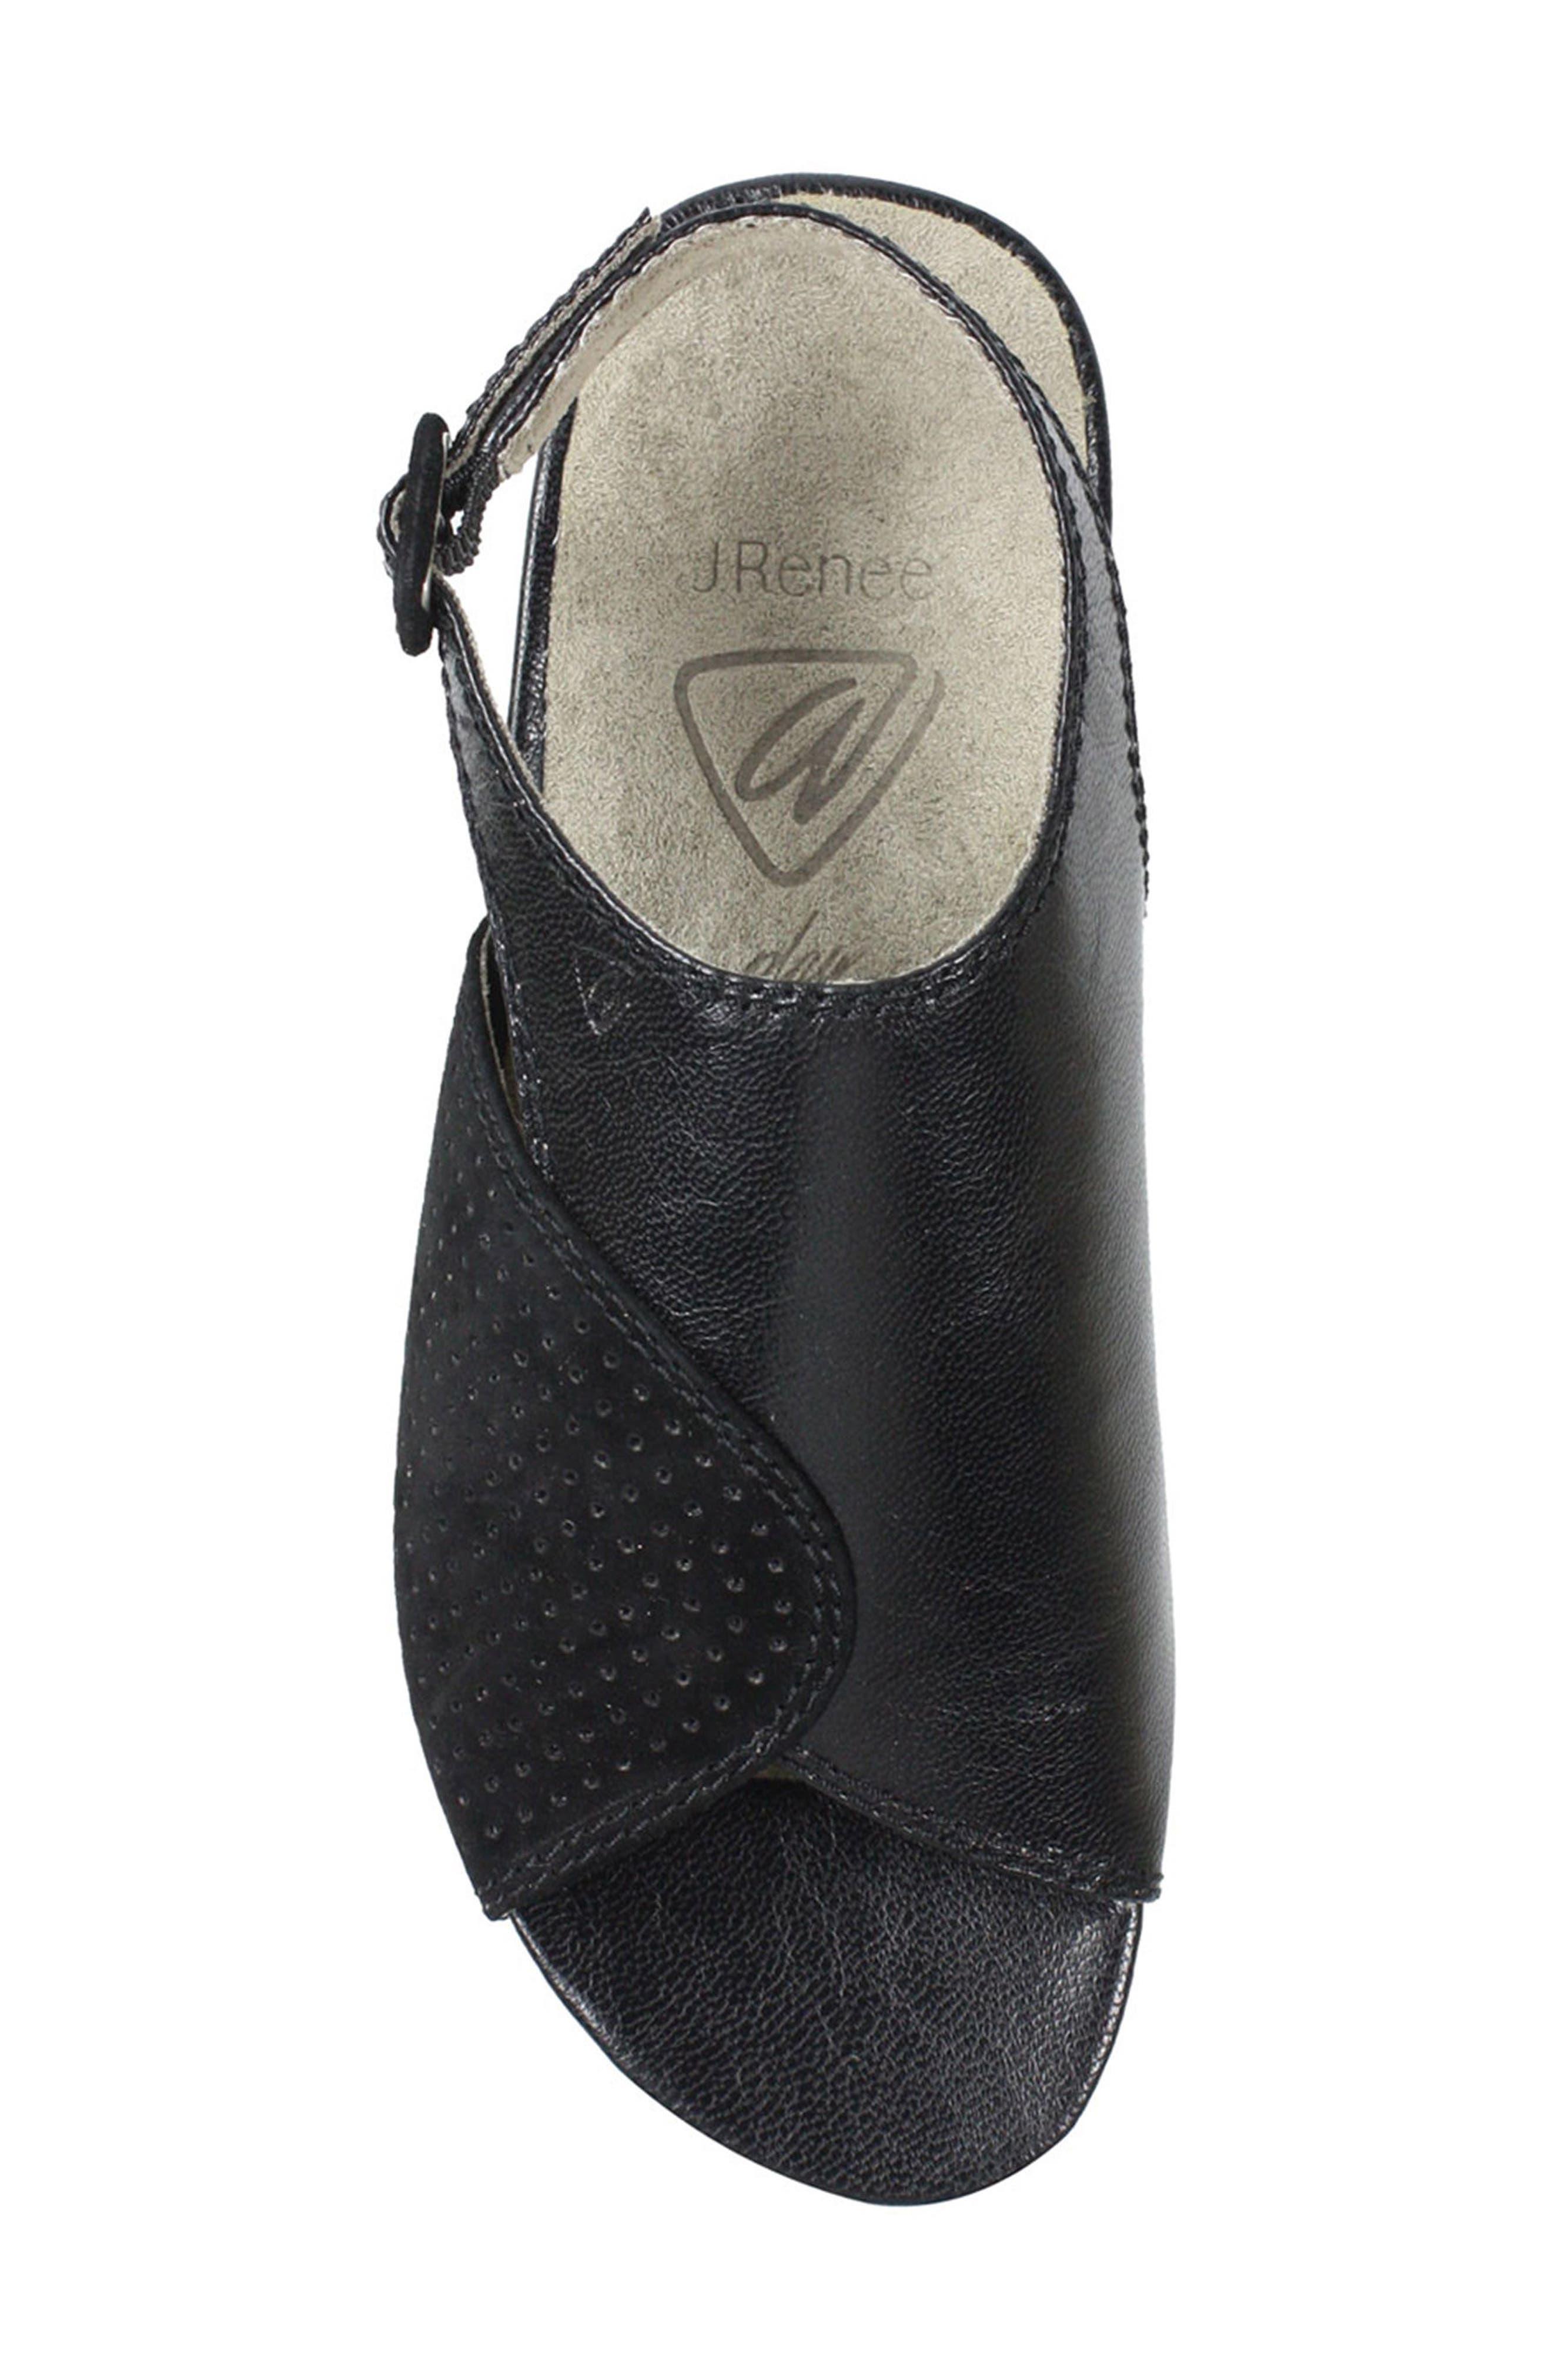 Dalenna Ankle Strap Sandal,                             Alternate thumbnail 5, color,                             Black Leather